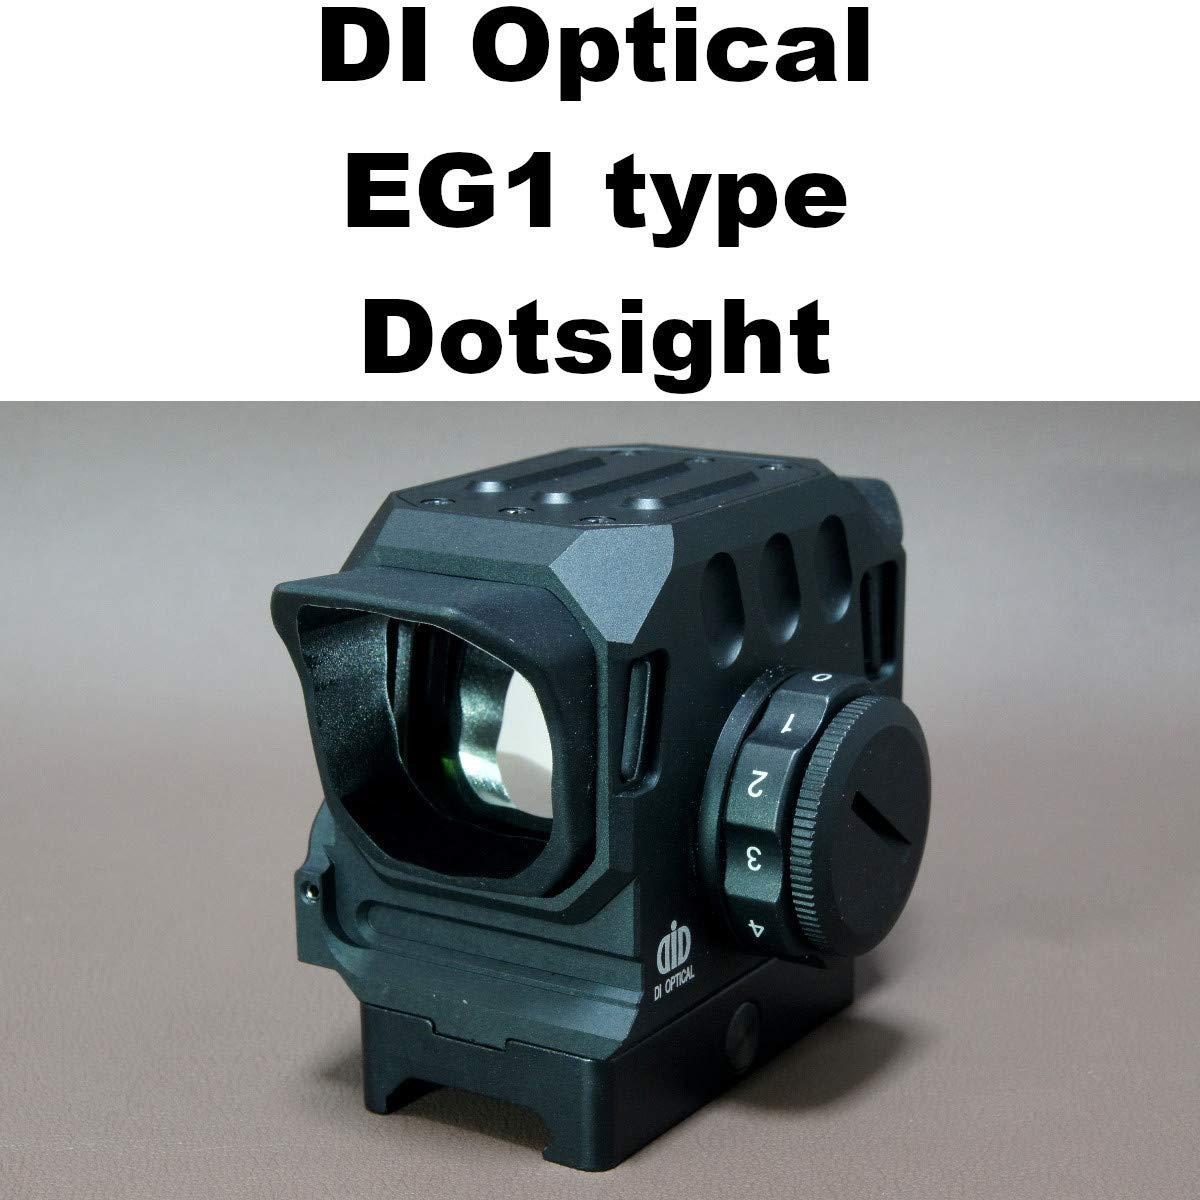 DI Optical EG1 タイプ ドットサイト 559-805 エアガン 電動ガン ガスガン スコープ B07S92D96Y